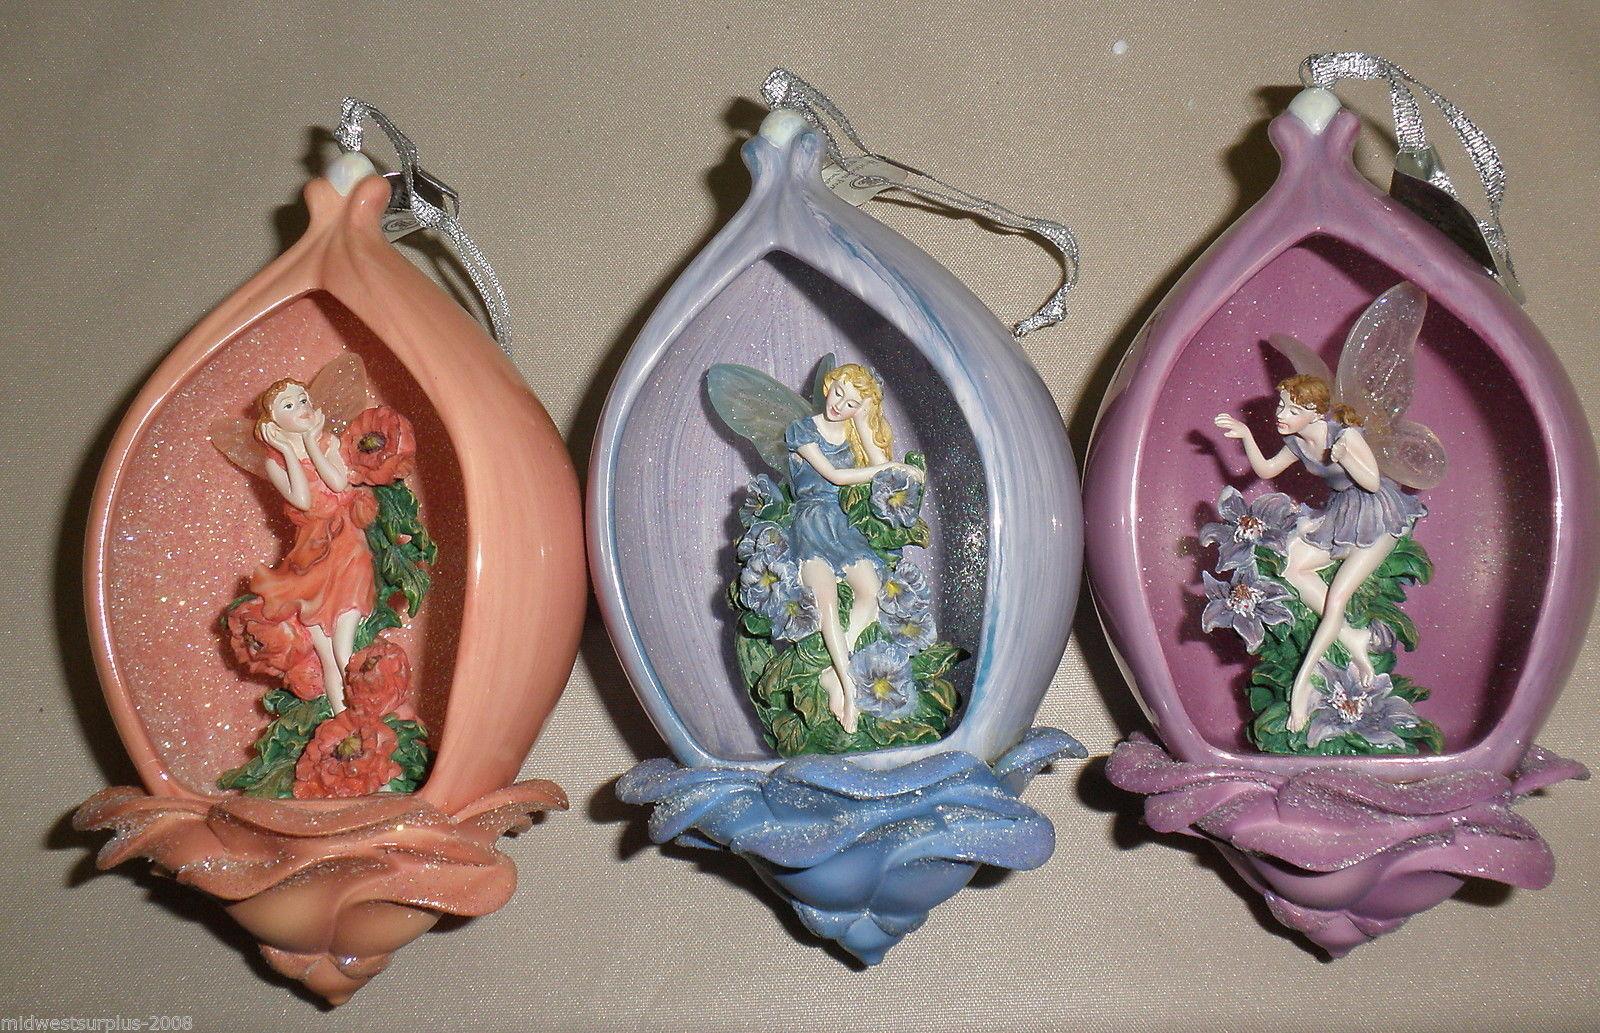 Bradford Edition 5th Issue Secret Garden Heirloom Porcelain Ornaments (3) #38855